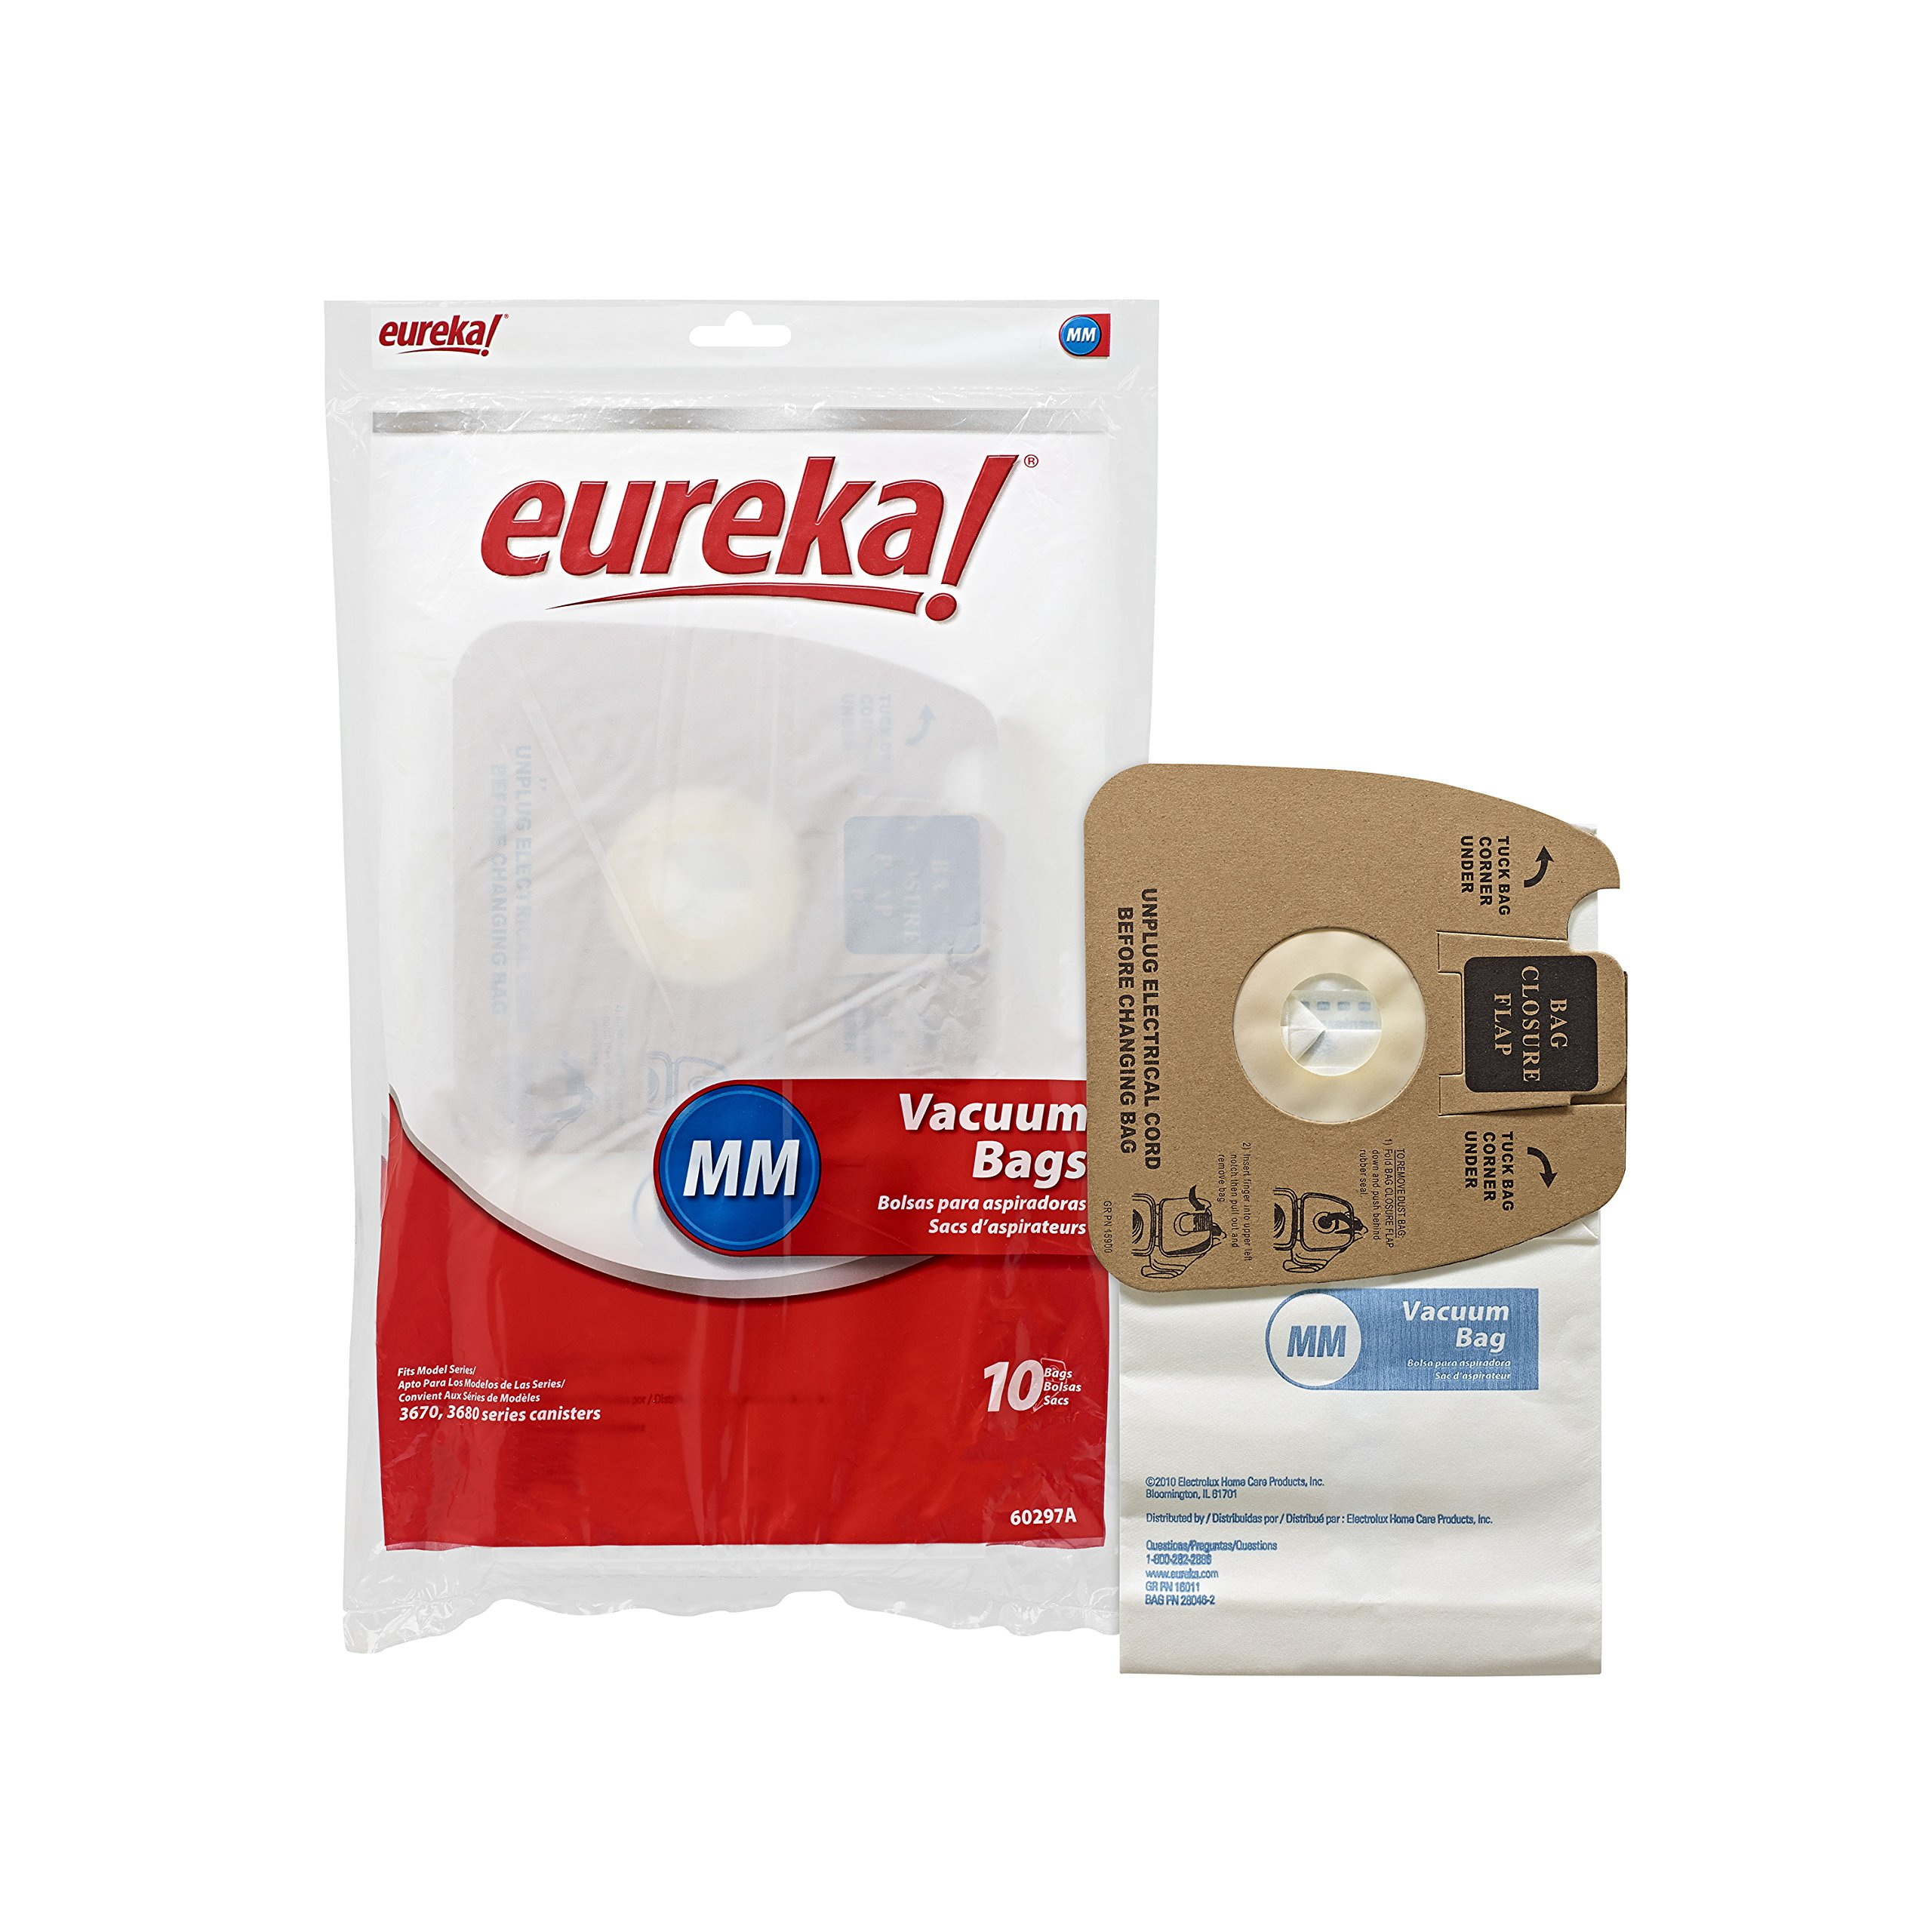 Genuine Eureka MM Vacuum Bag 60297A Style - 10 bags per Unit